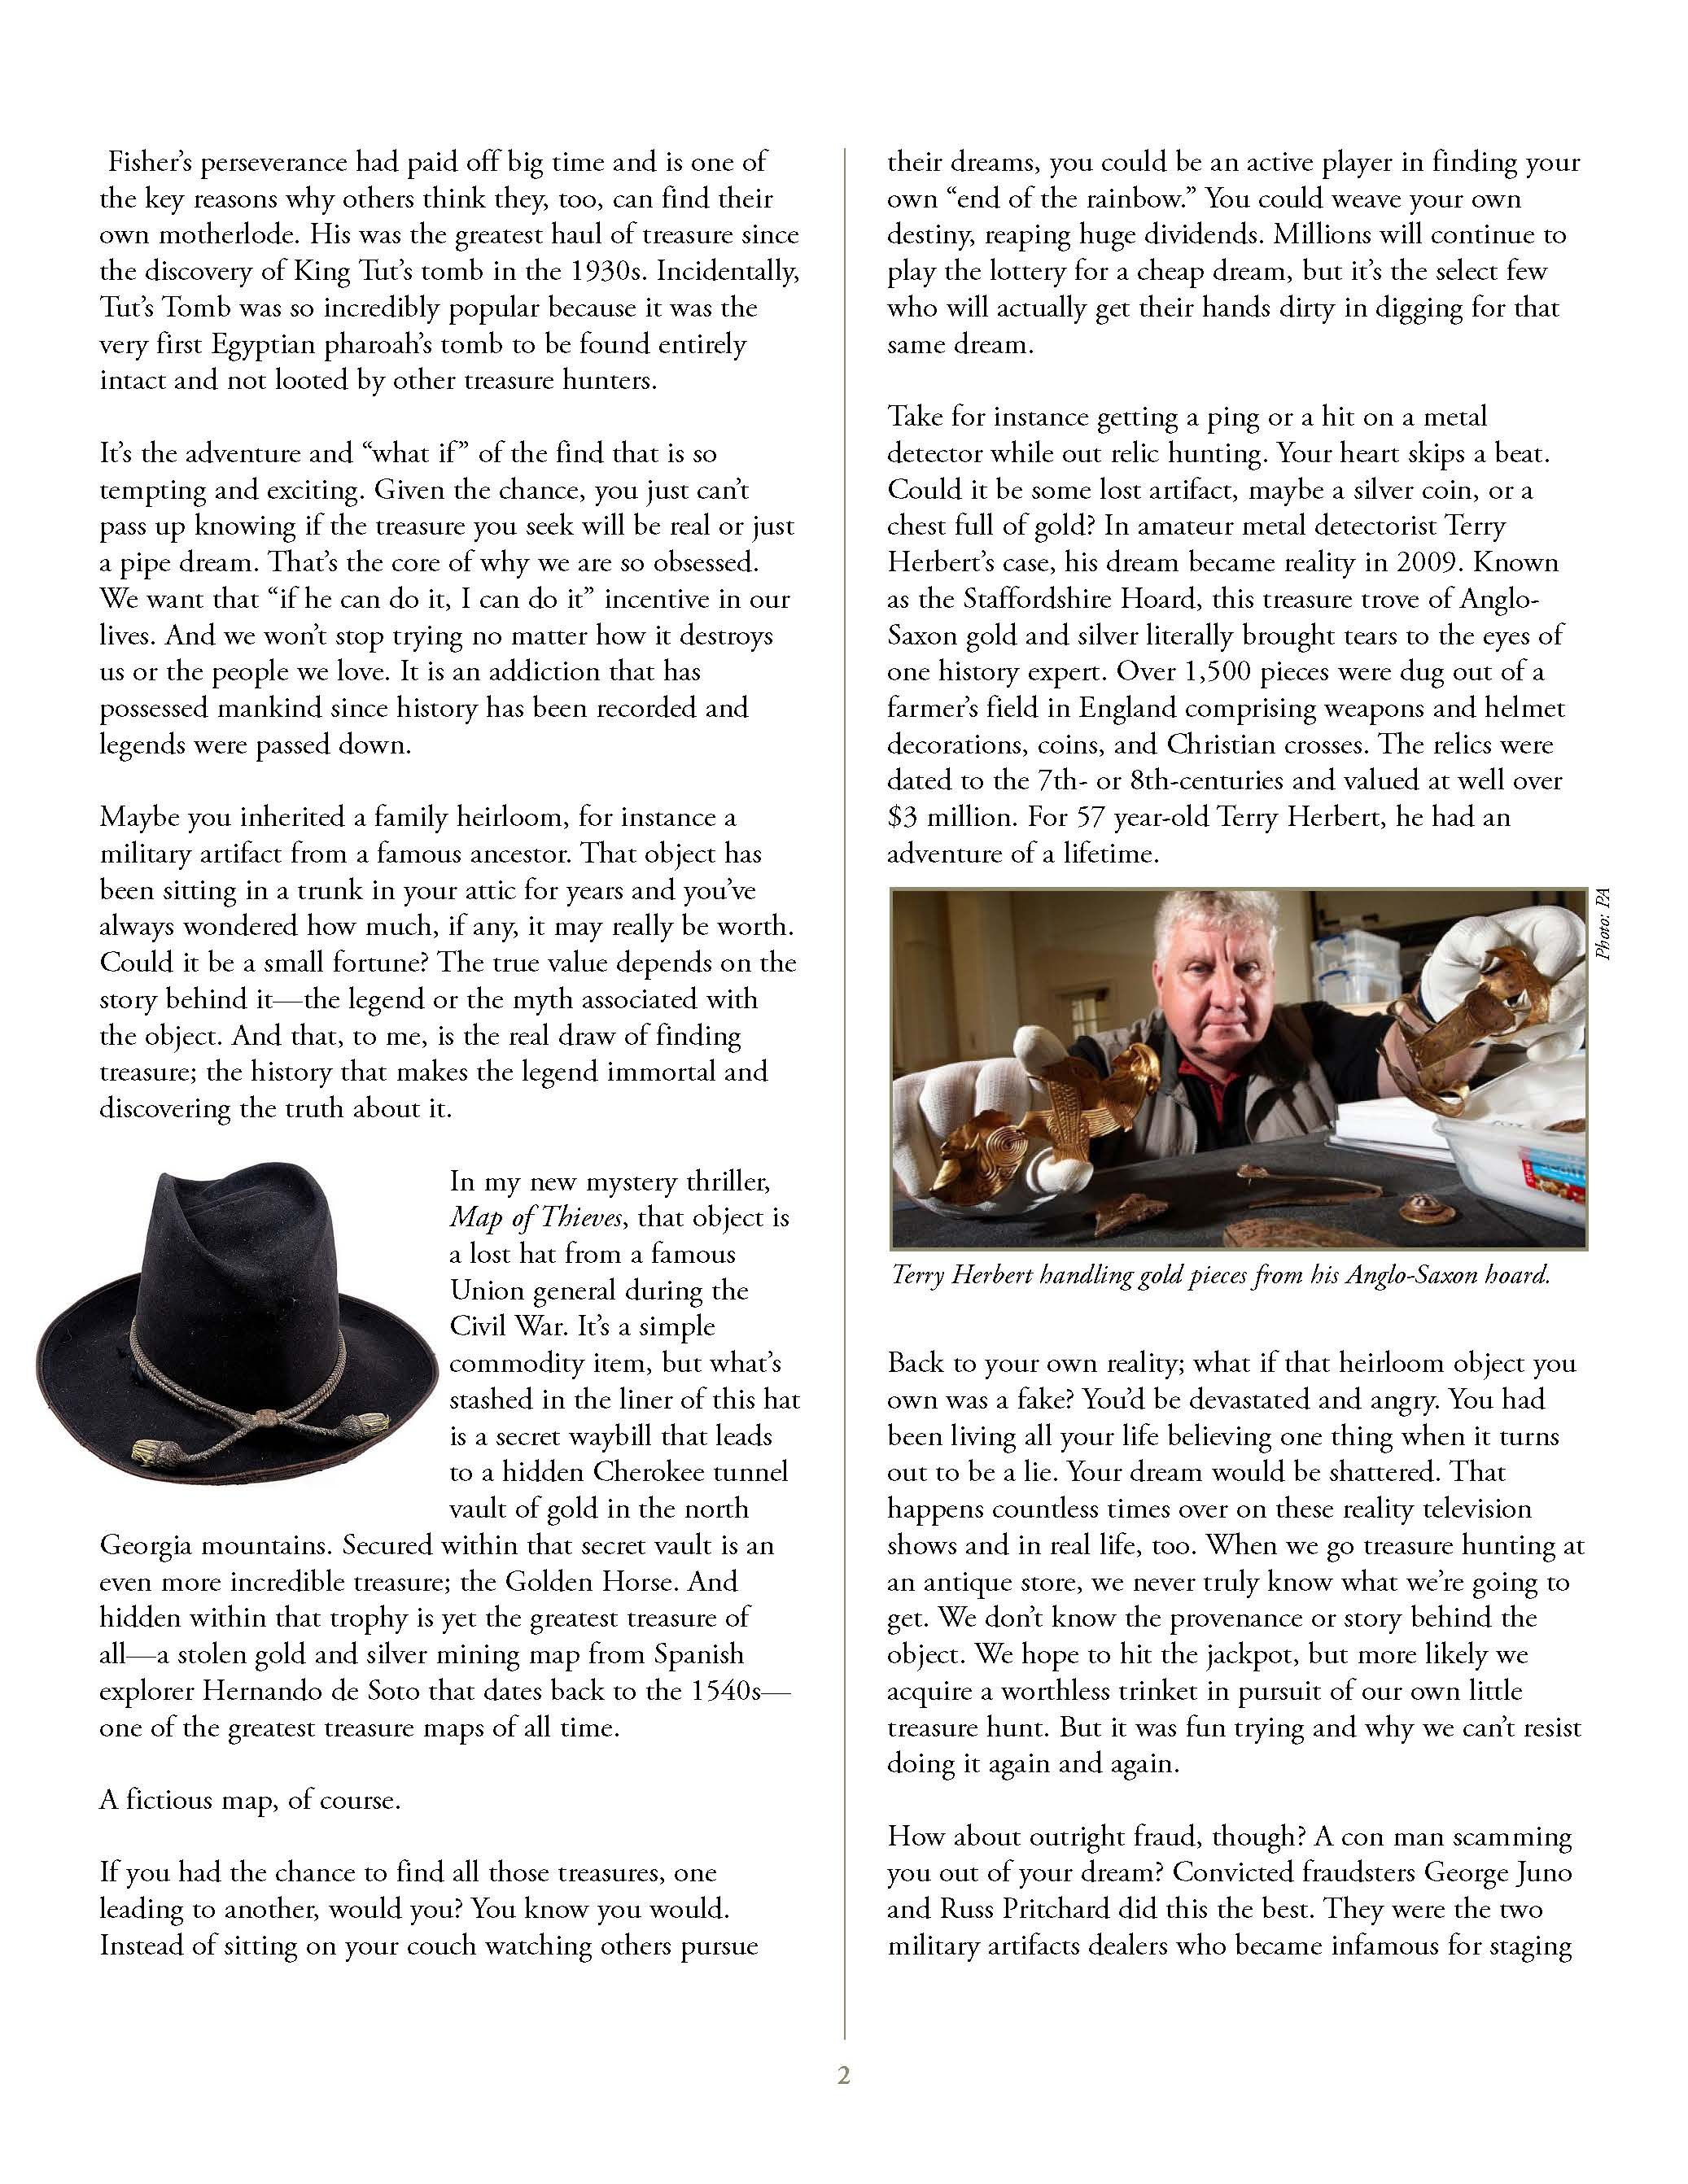 Finding-Treasure-article_Page_2.jpg